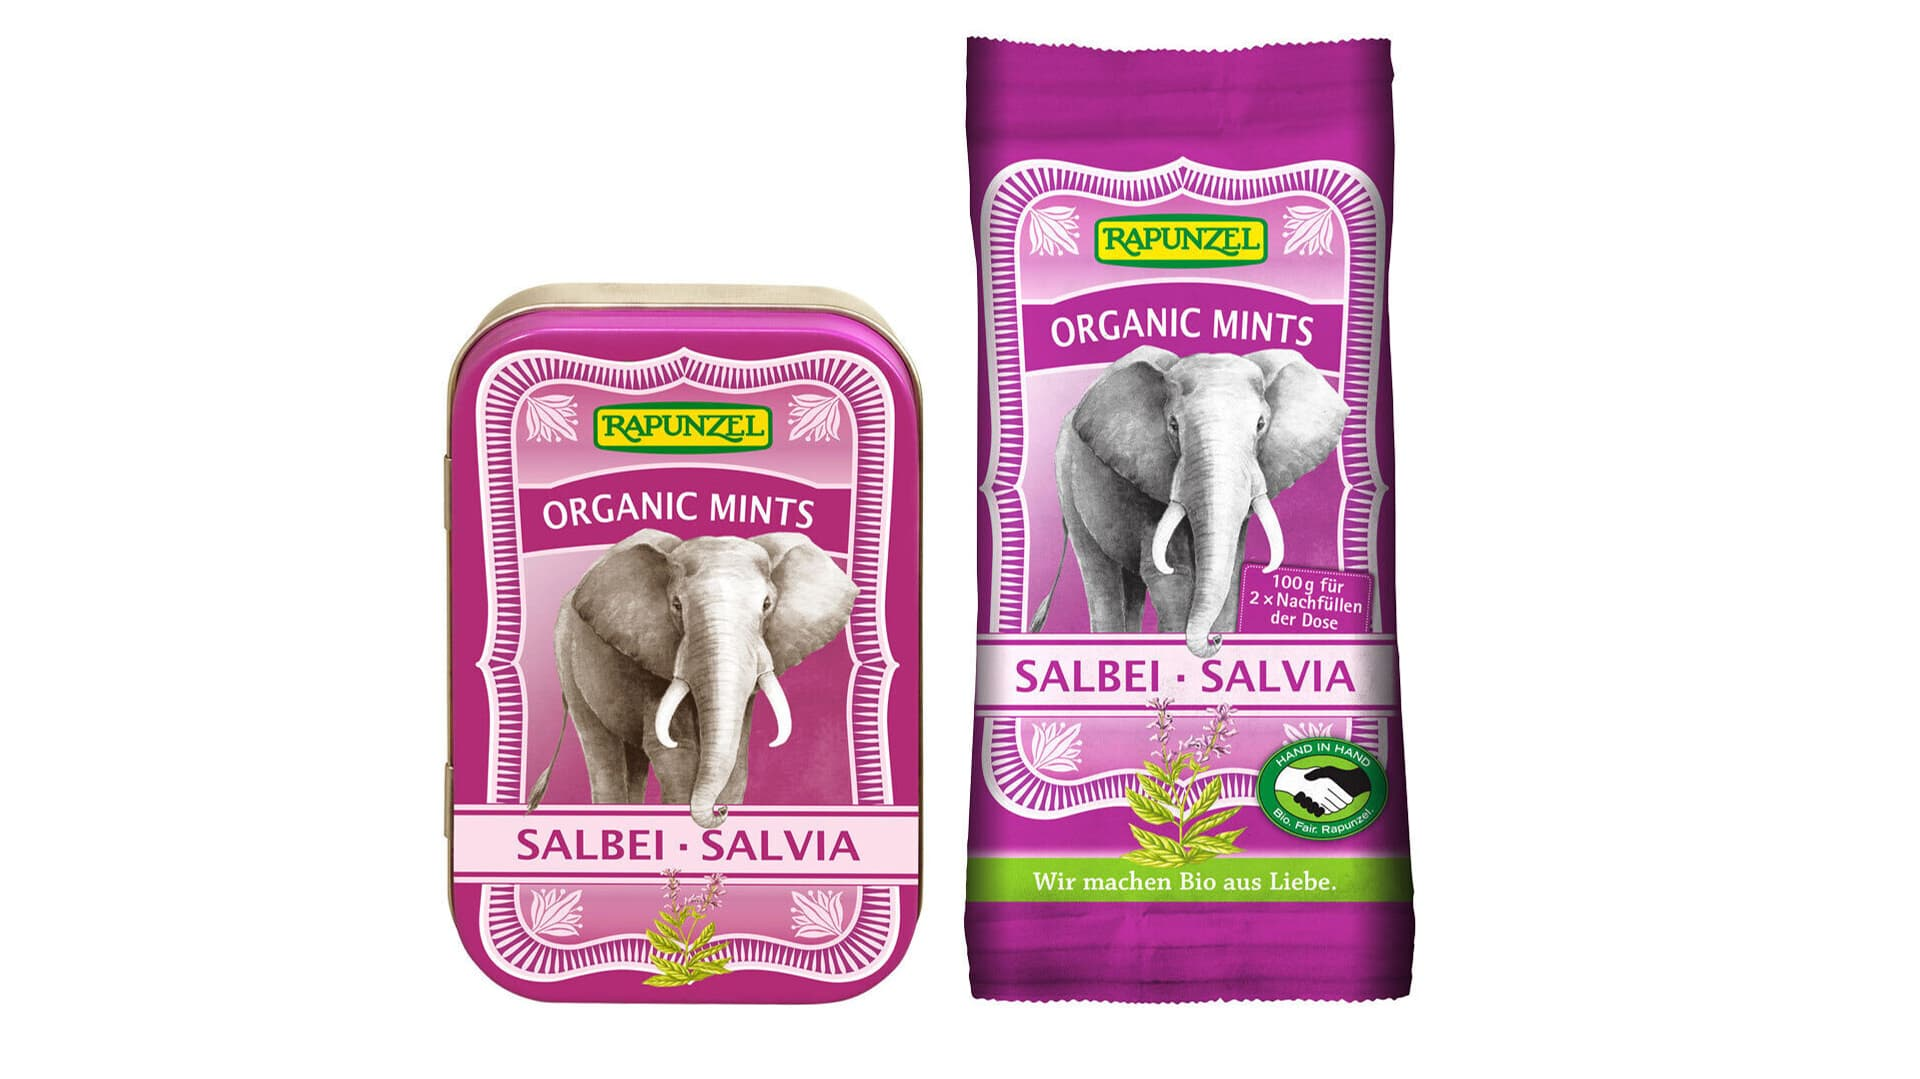 Rapunzel Organic Mints